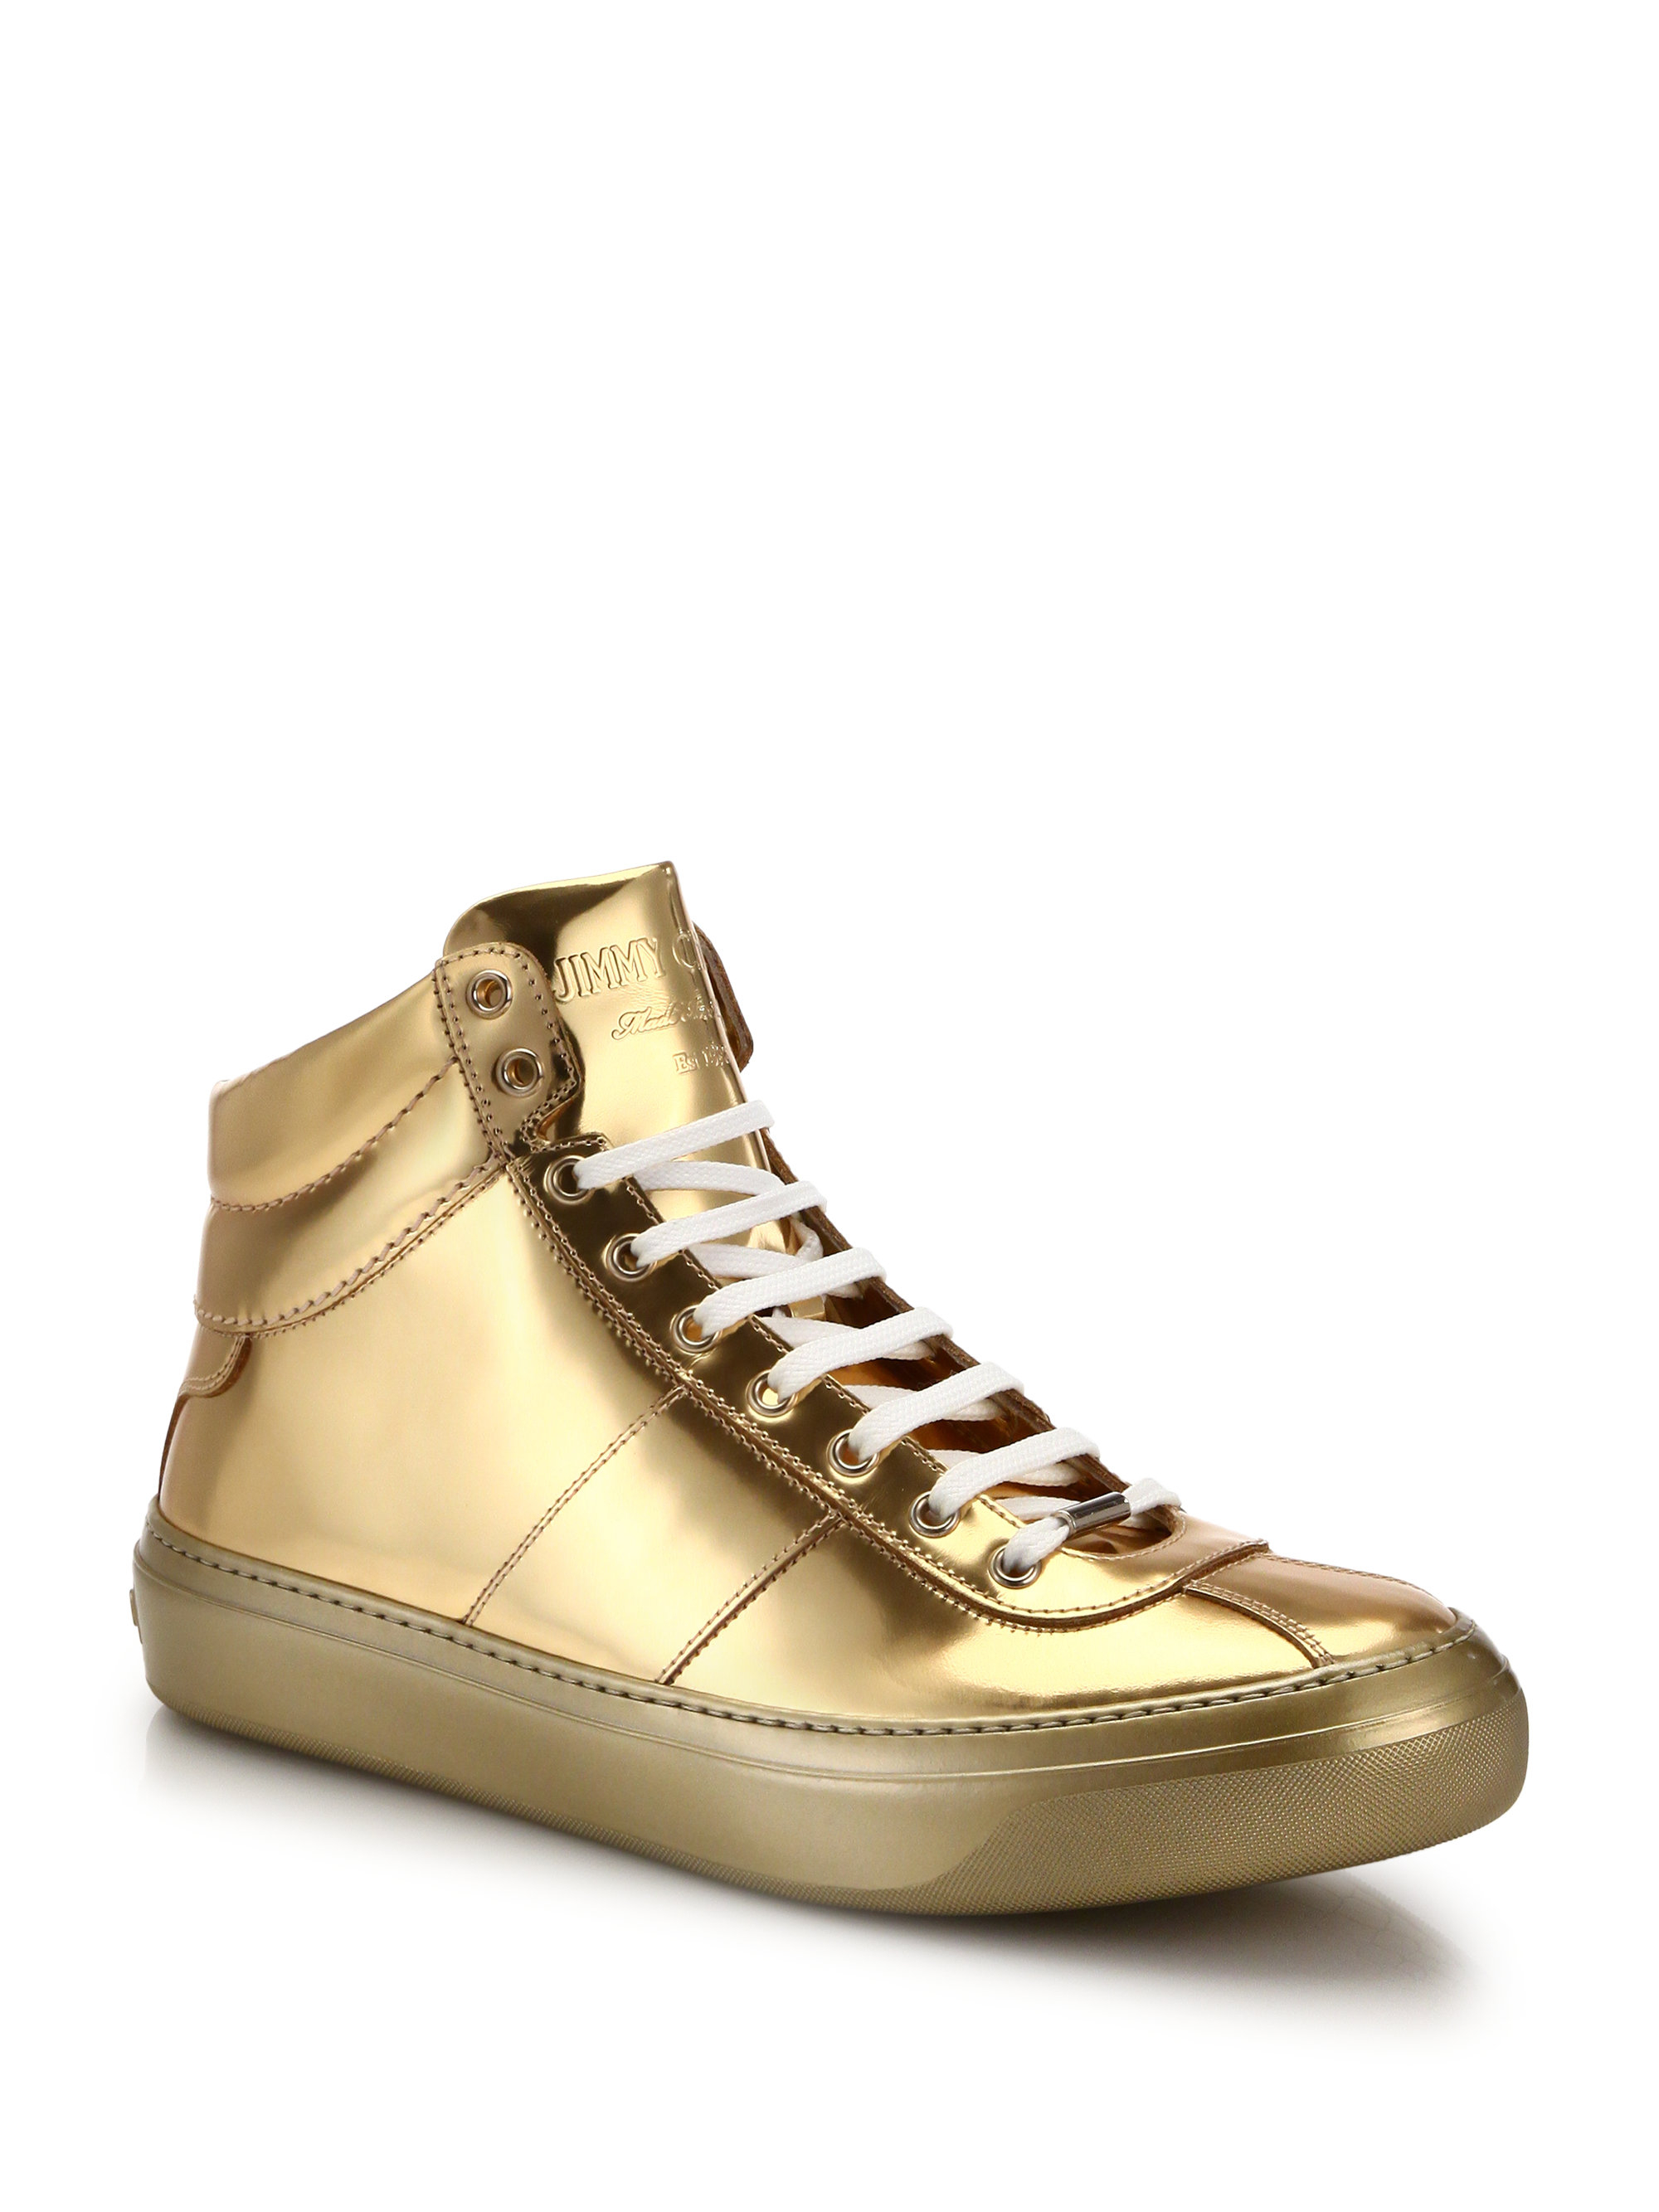 Lyst Jimmy Choo Belgrave Metallic High Top Sneakers In Metallic